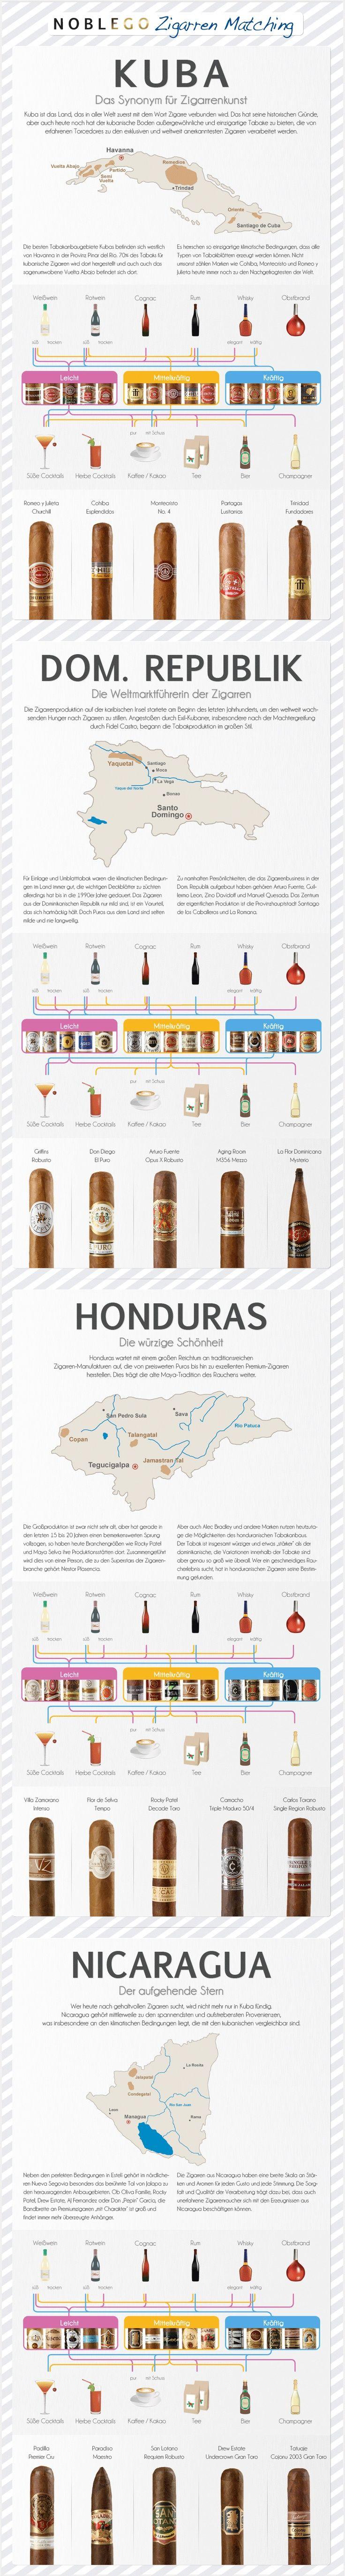 498 best cigars images on Pinterest